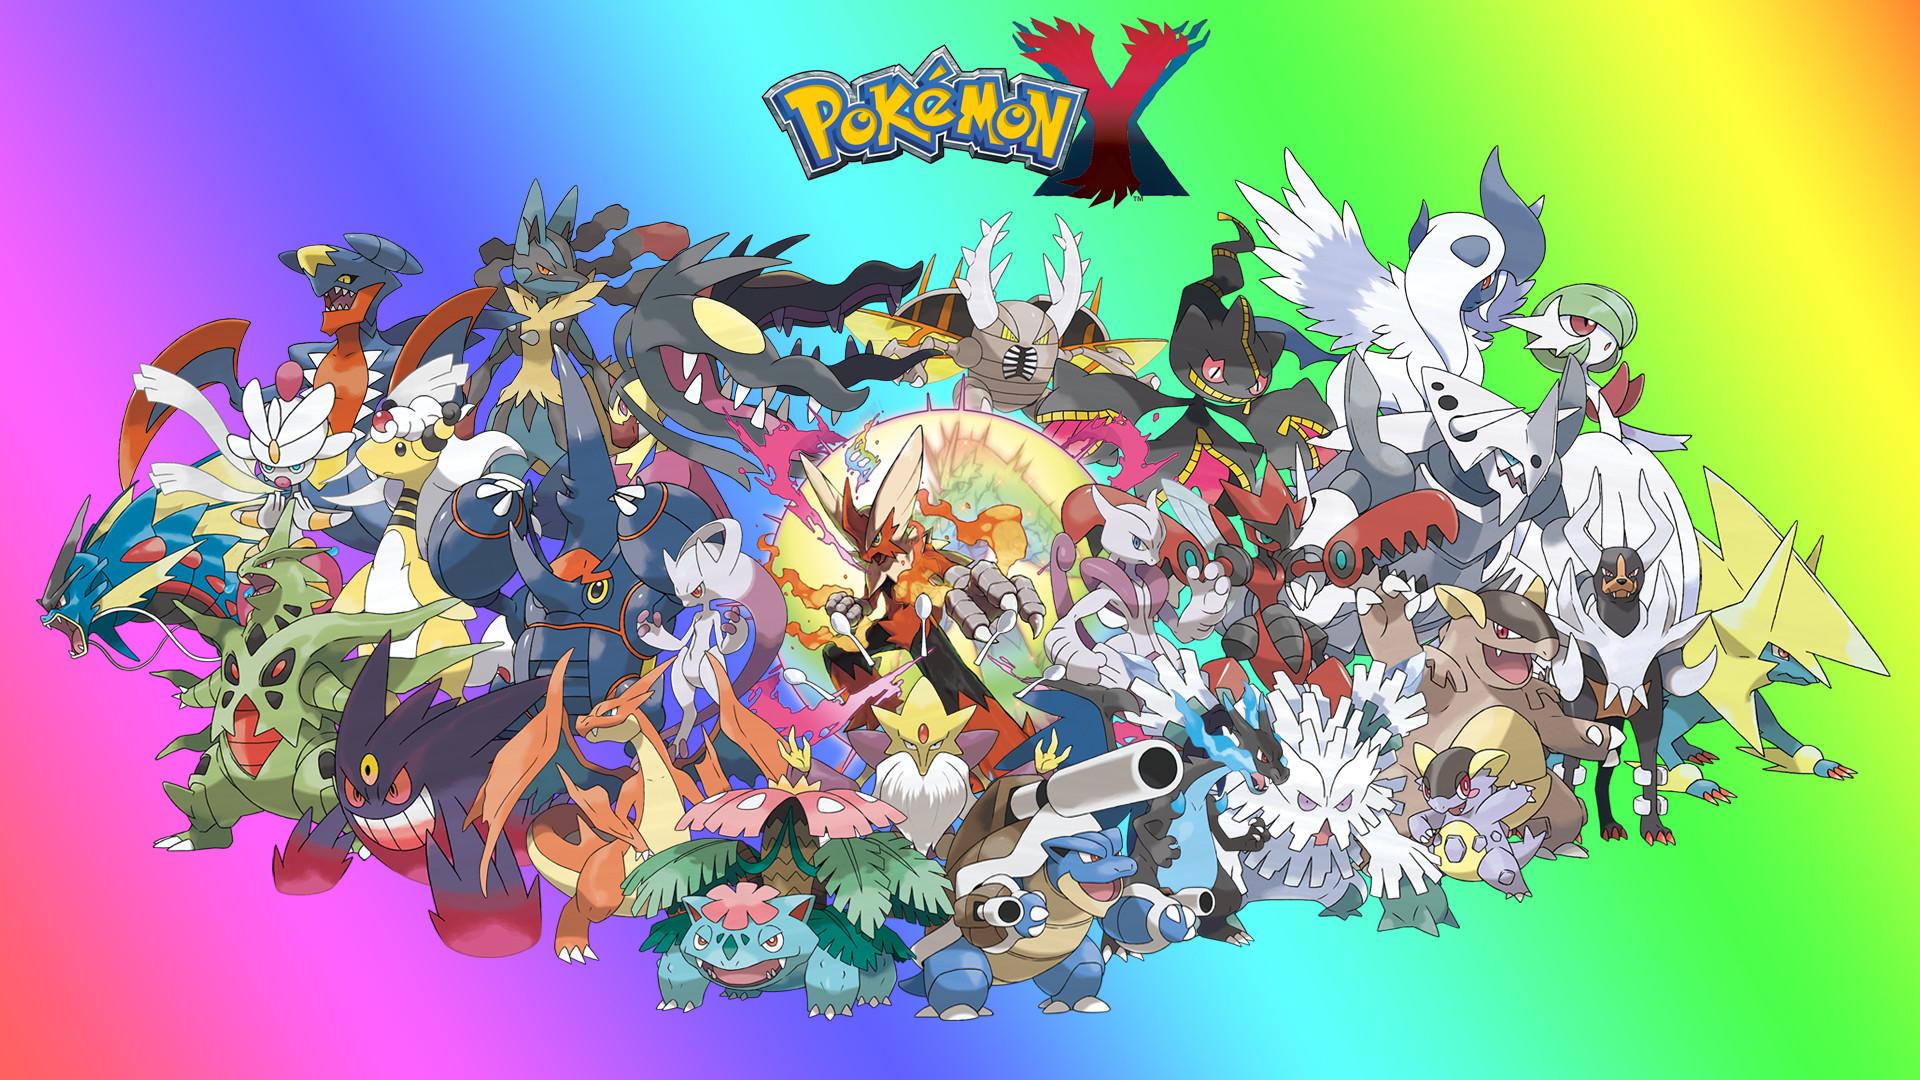 pokemon mega evolutions by zupertompa fan art wallpaper games 2014 .